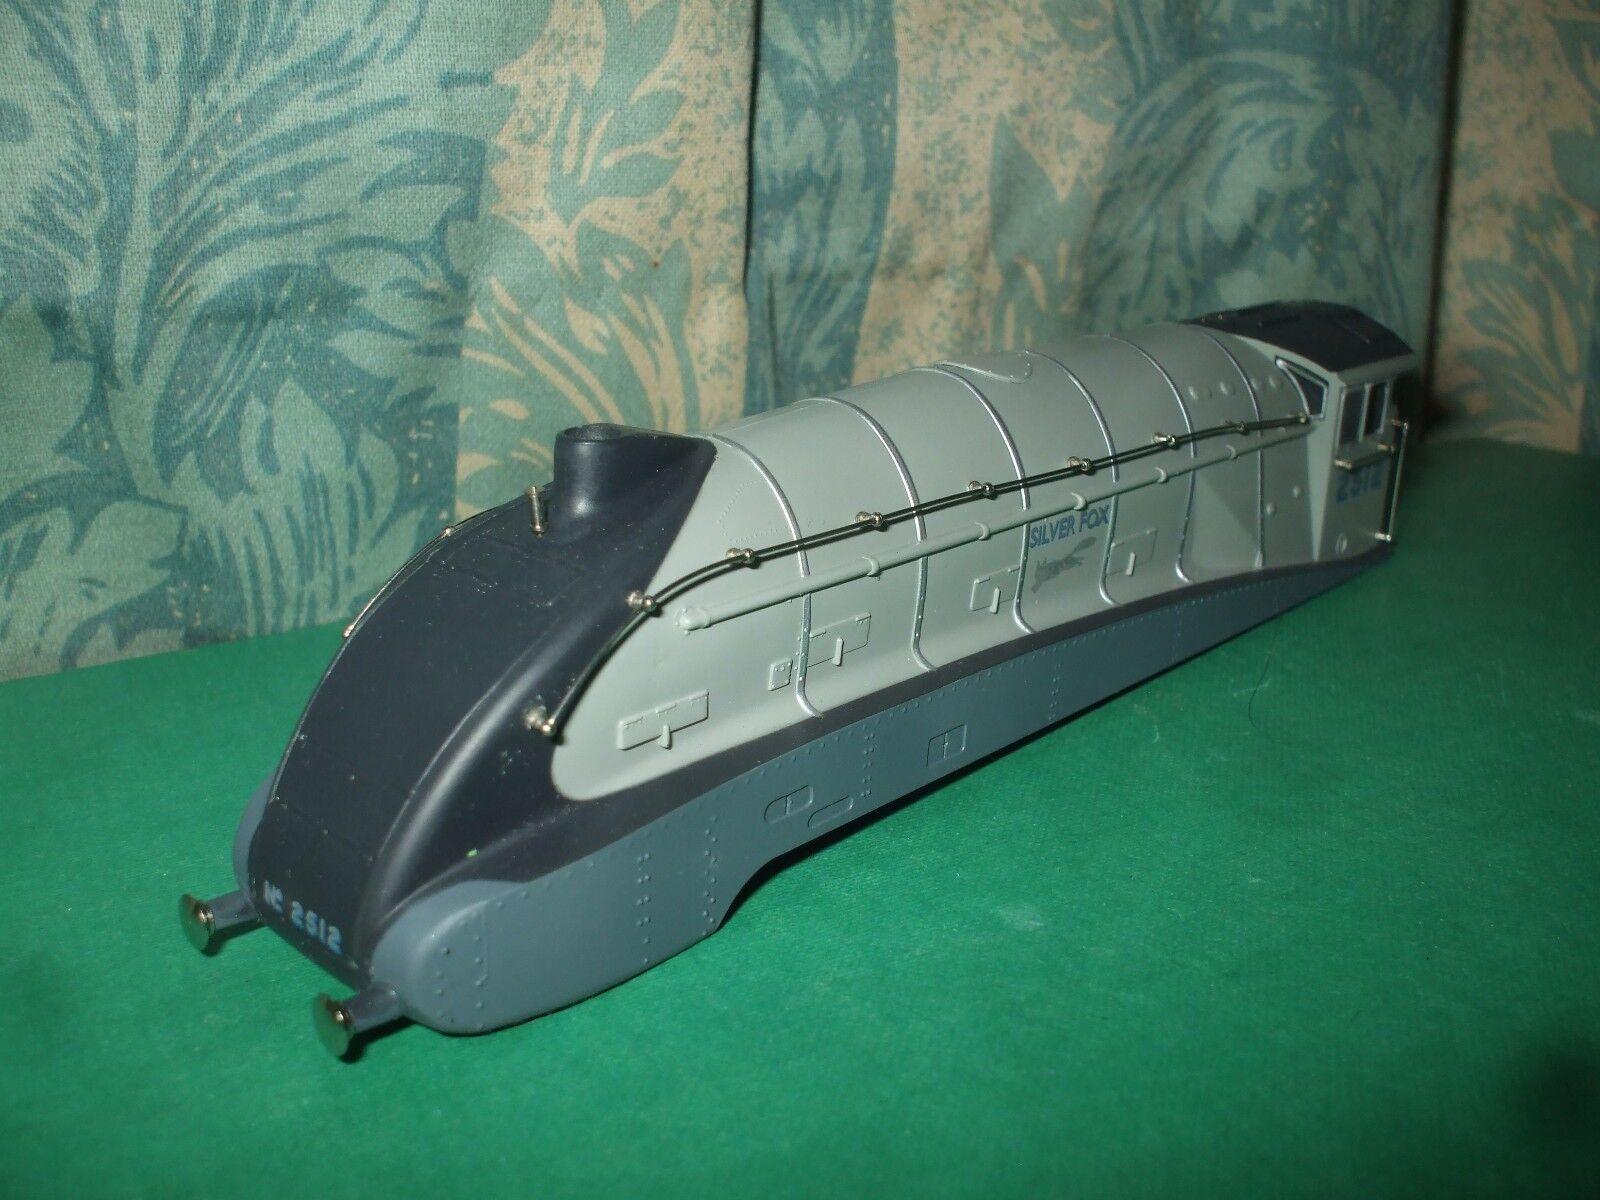 BACHuomoN LNER A4 classe argento LOCO corpo ONLY  argento FOX